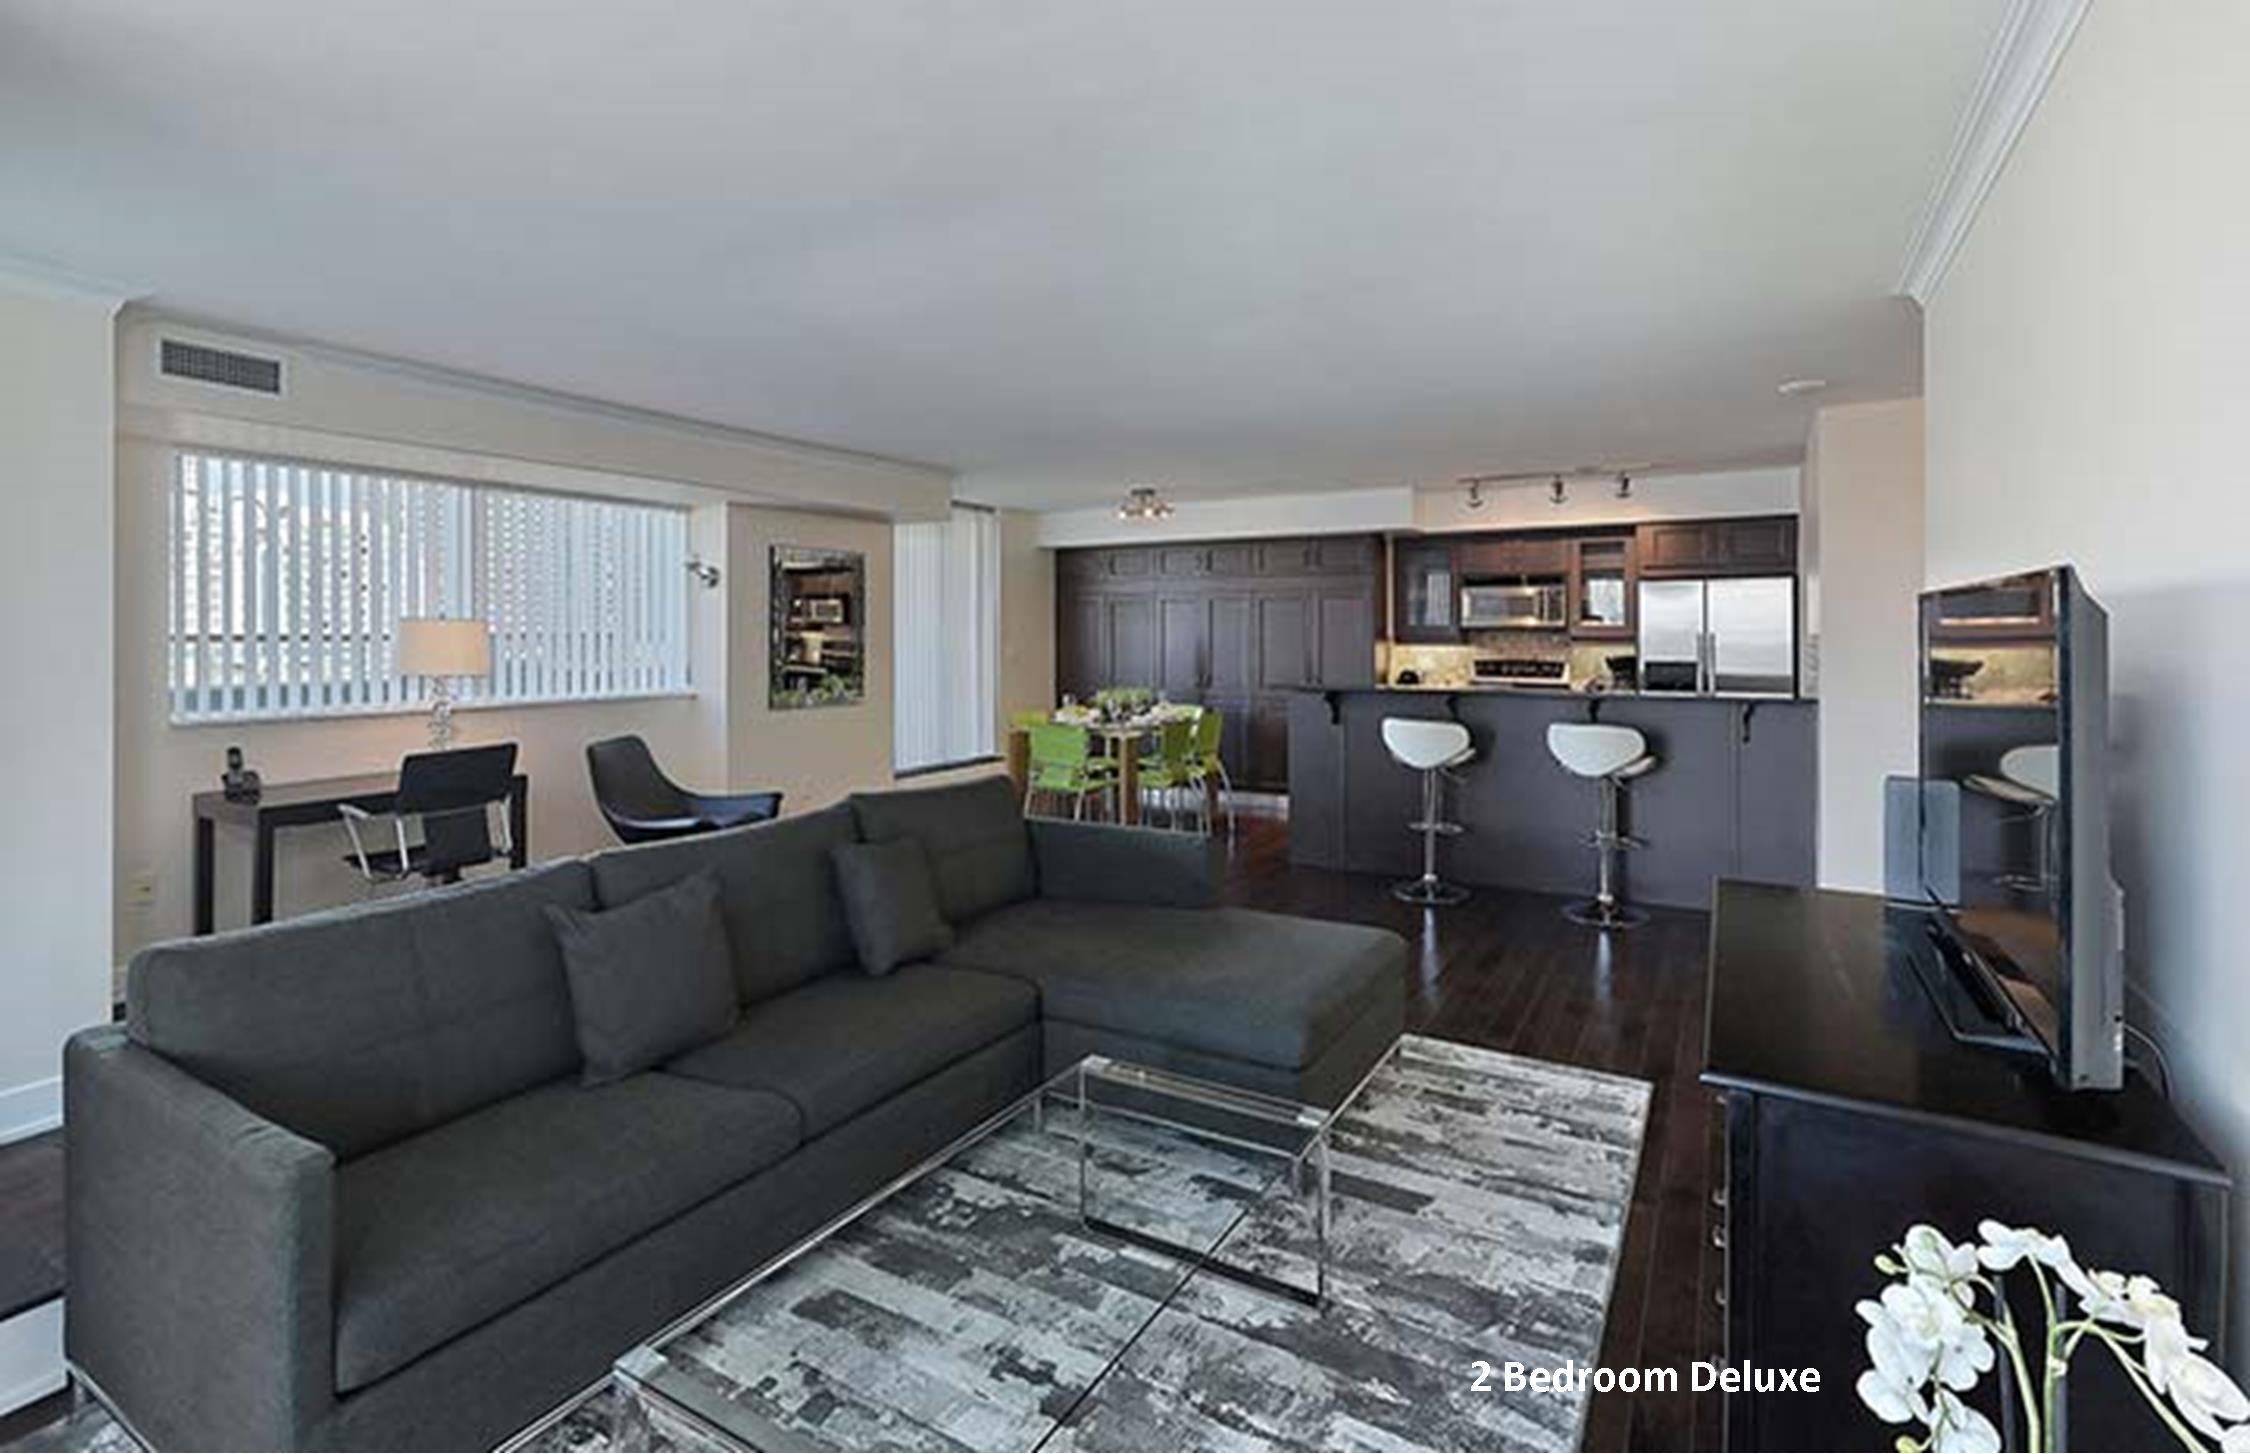 Element 2 Bedroom Deluxe Furnished Suites in Toronto Living Room